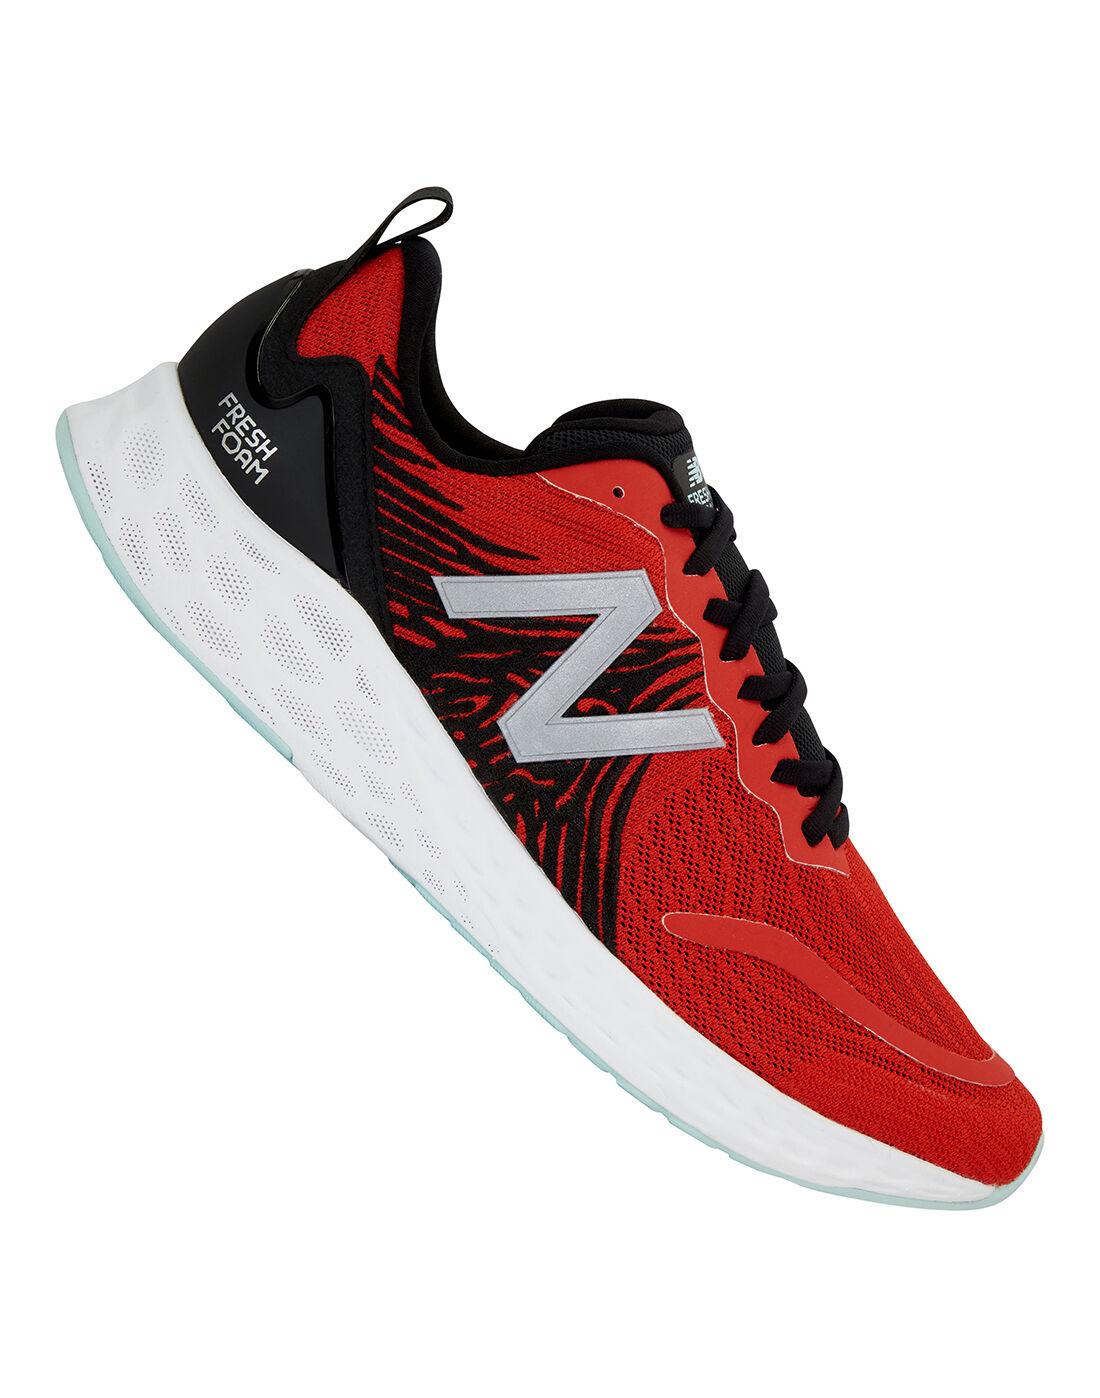 New Balance adidas lgbt white rainbow flag color meanings | Mens Fresh Foam Tempo